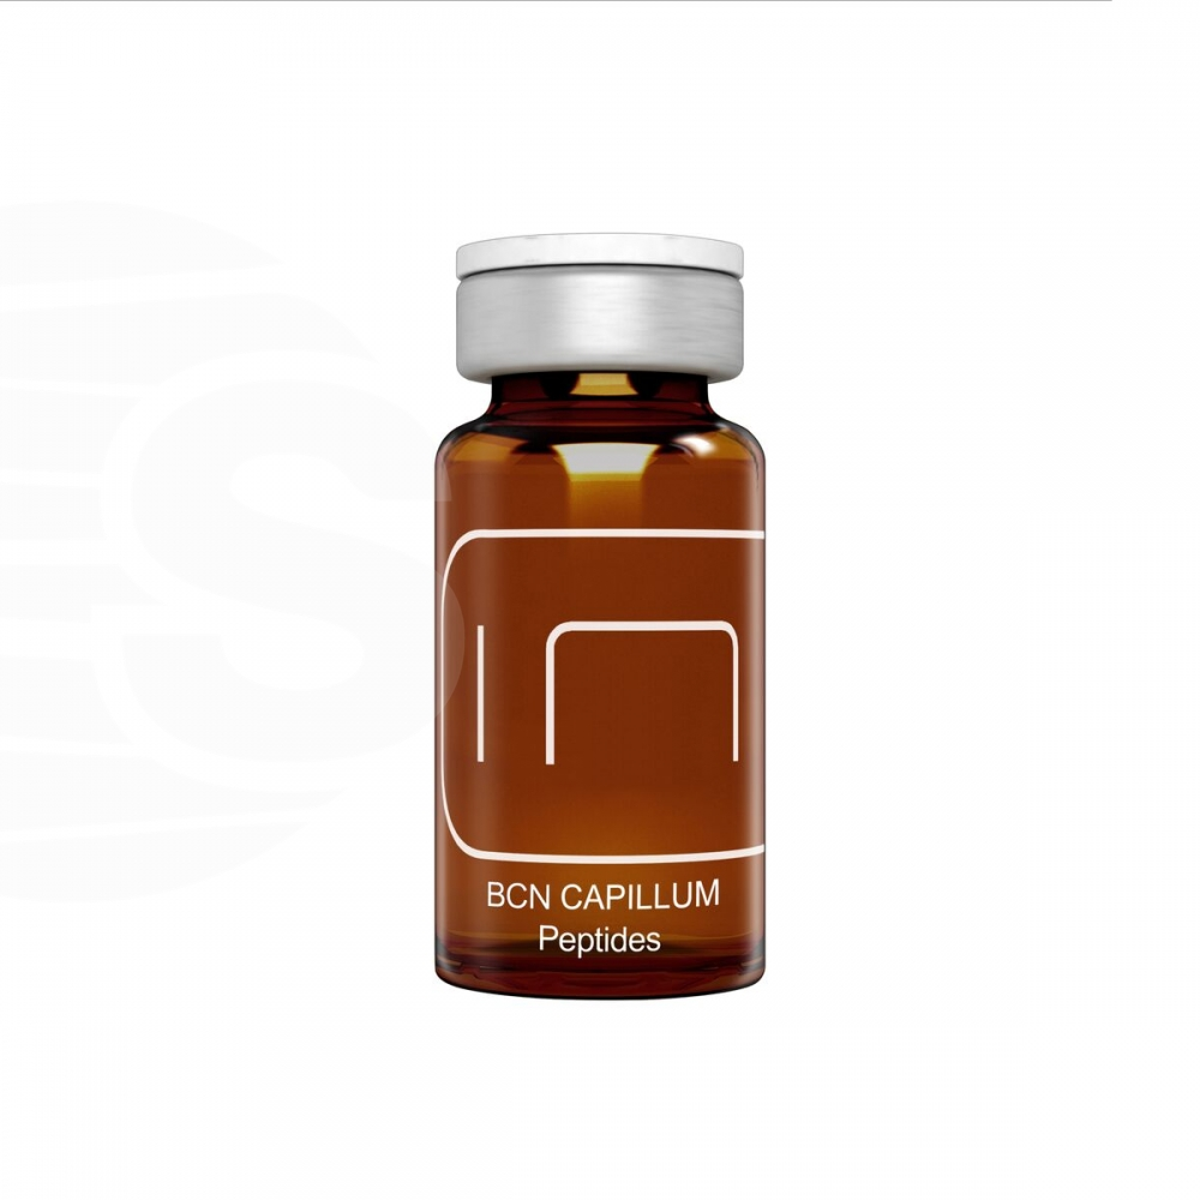 BCN Capillum - Advanced Cocktail per la Perdita di Capelli - Principi attivi -